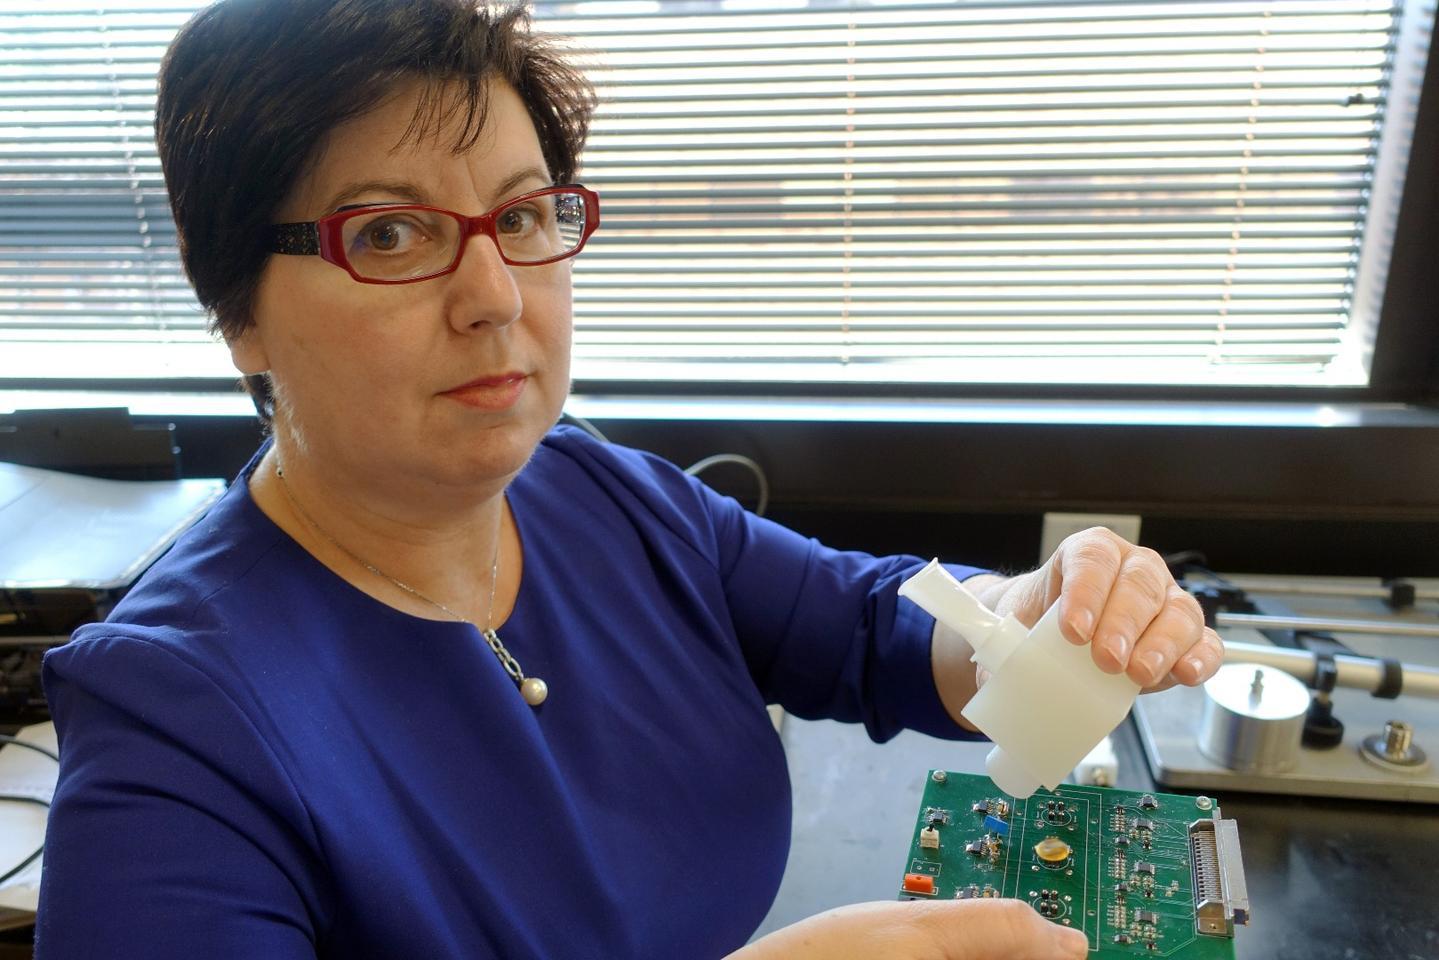 Prof. Perena Gouma with her prototype flu detector